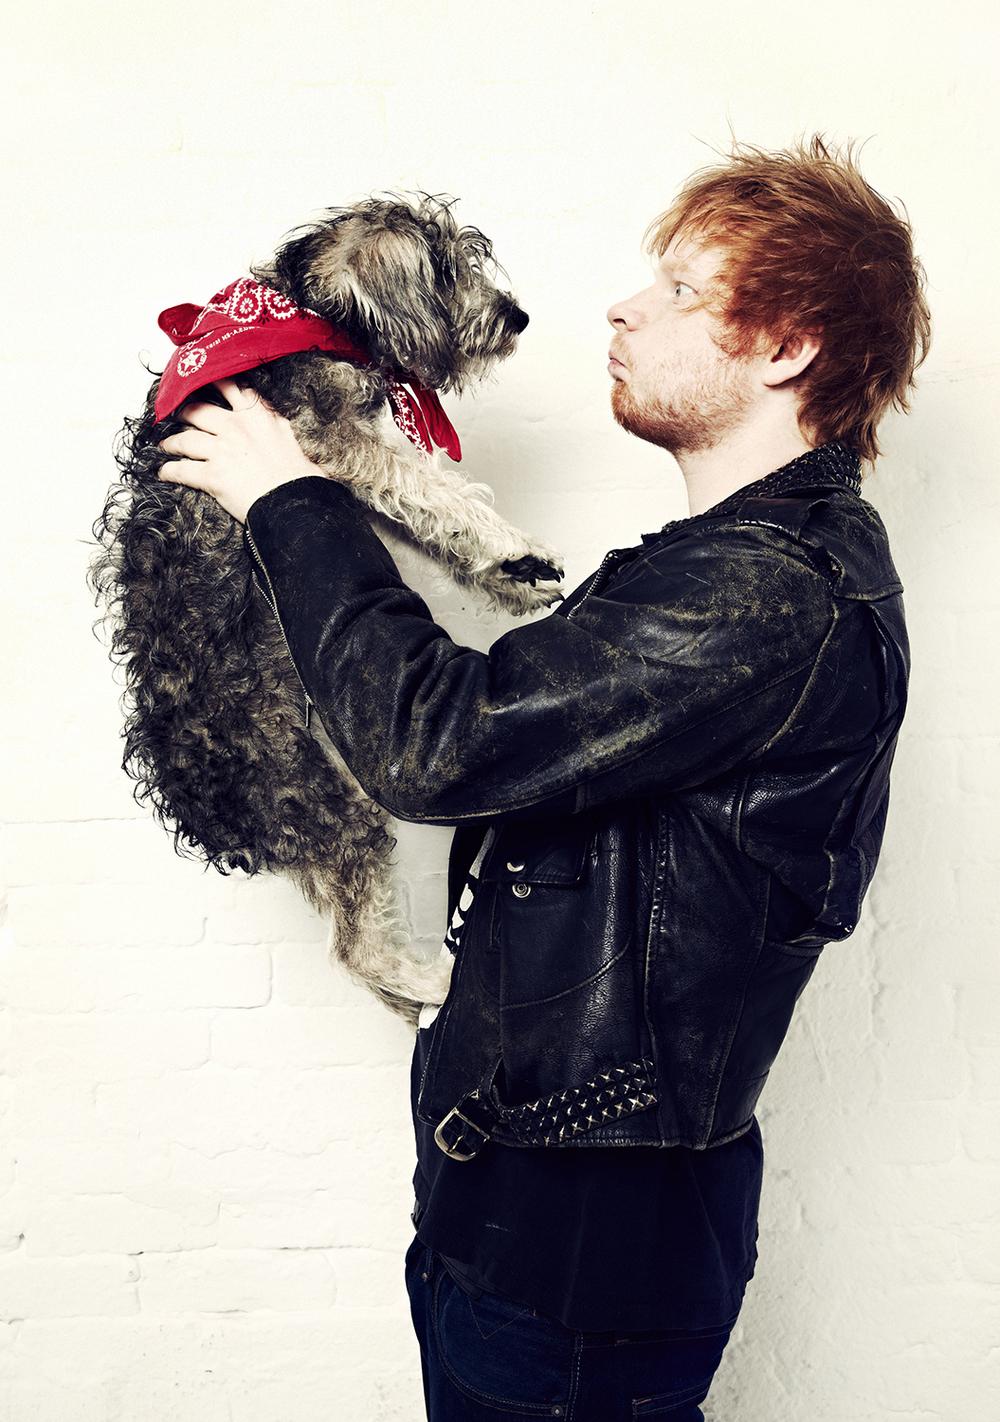 131030_Sheeran_04_Jacket_0356.jpg